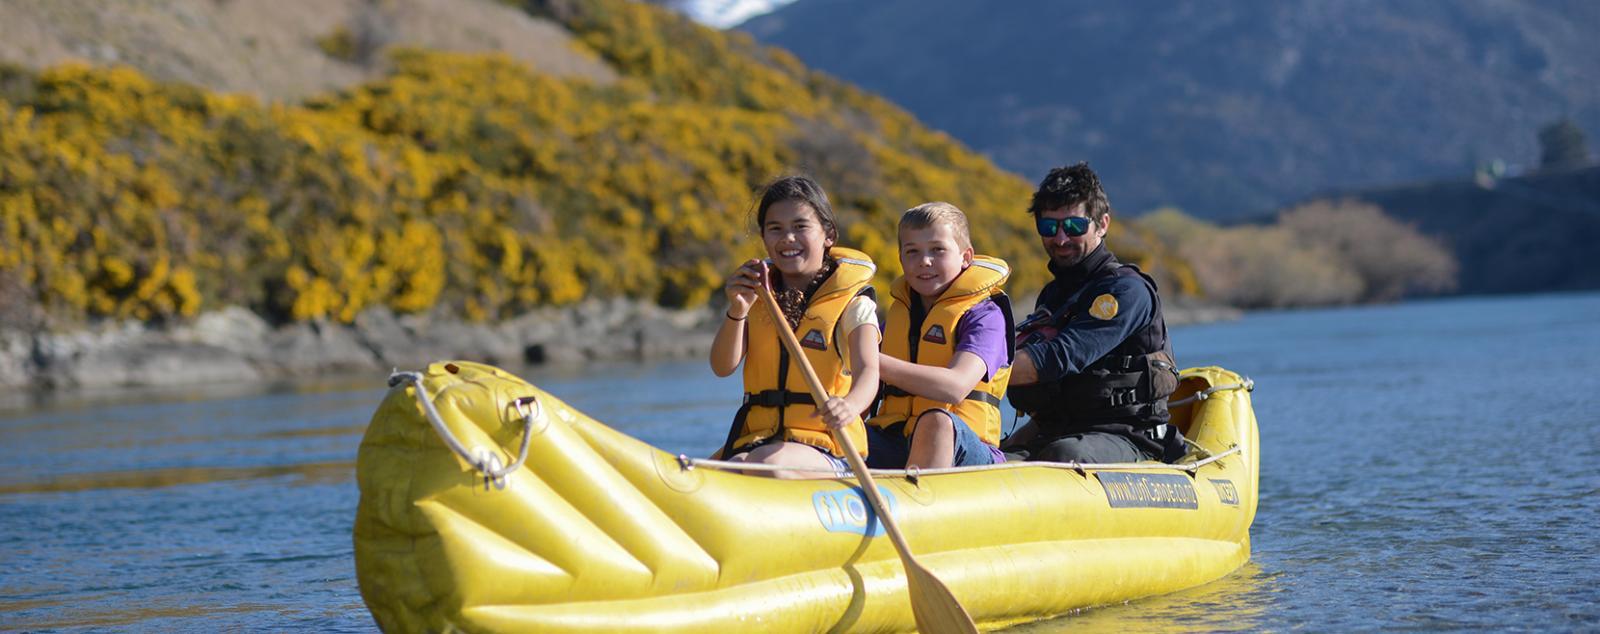 Family activities and kids birthday parties New Zealand Kidz Go